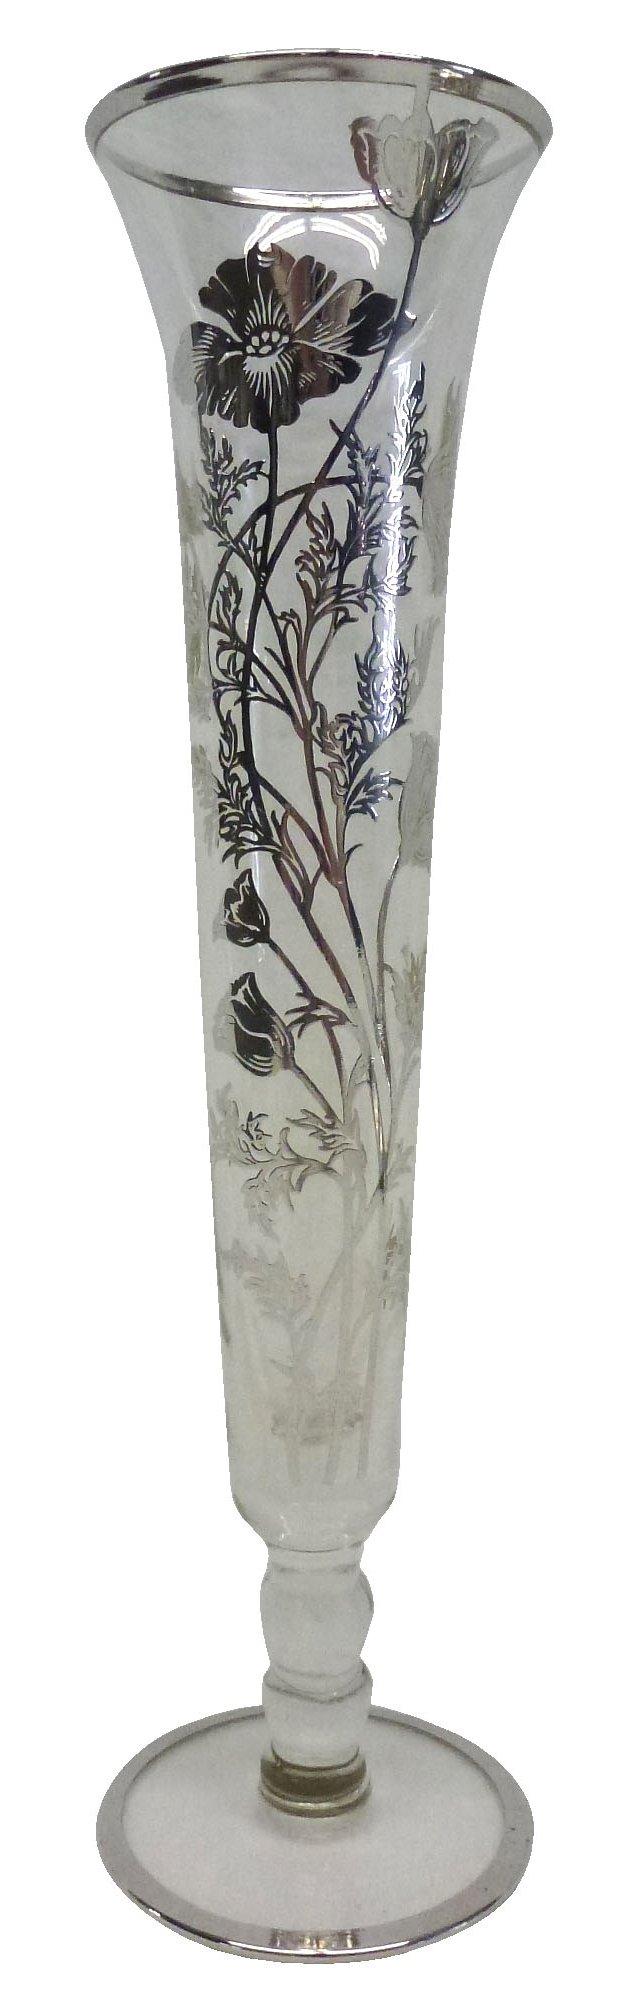 Glass Bud Vase w/ Overlay